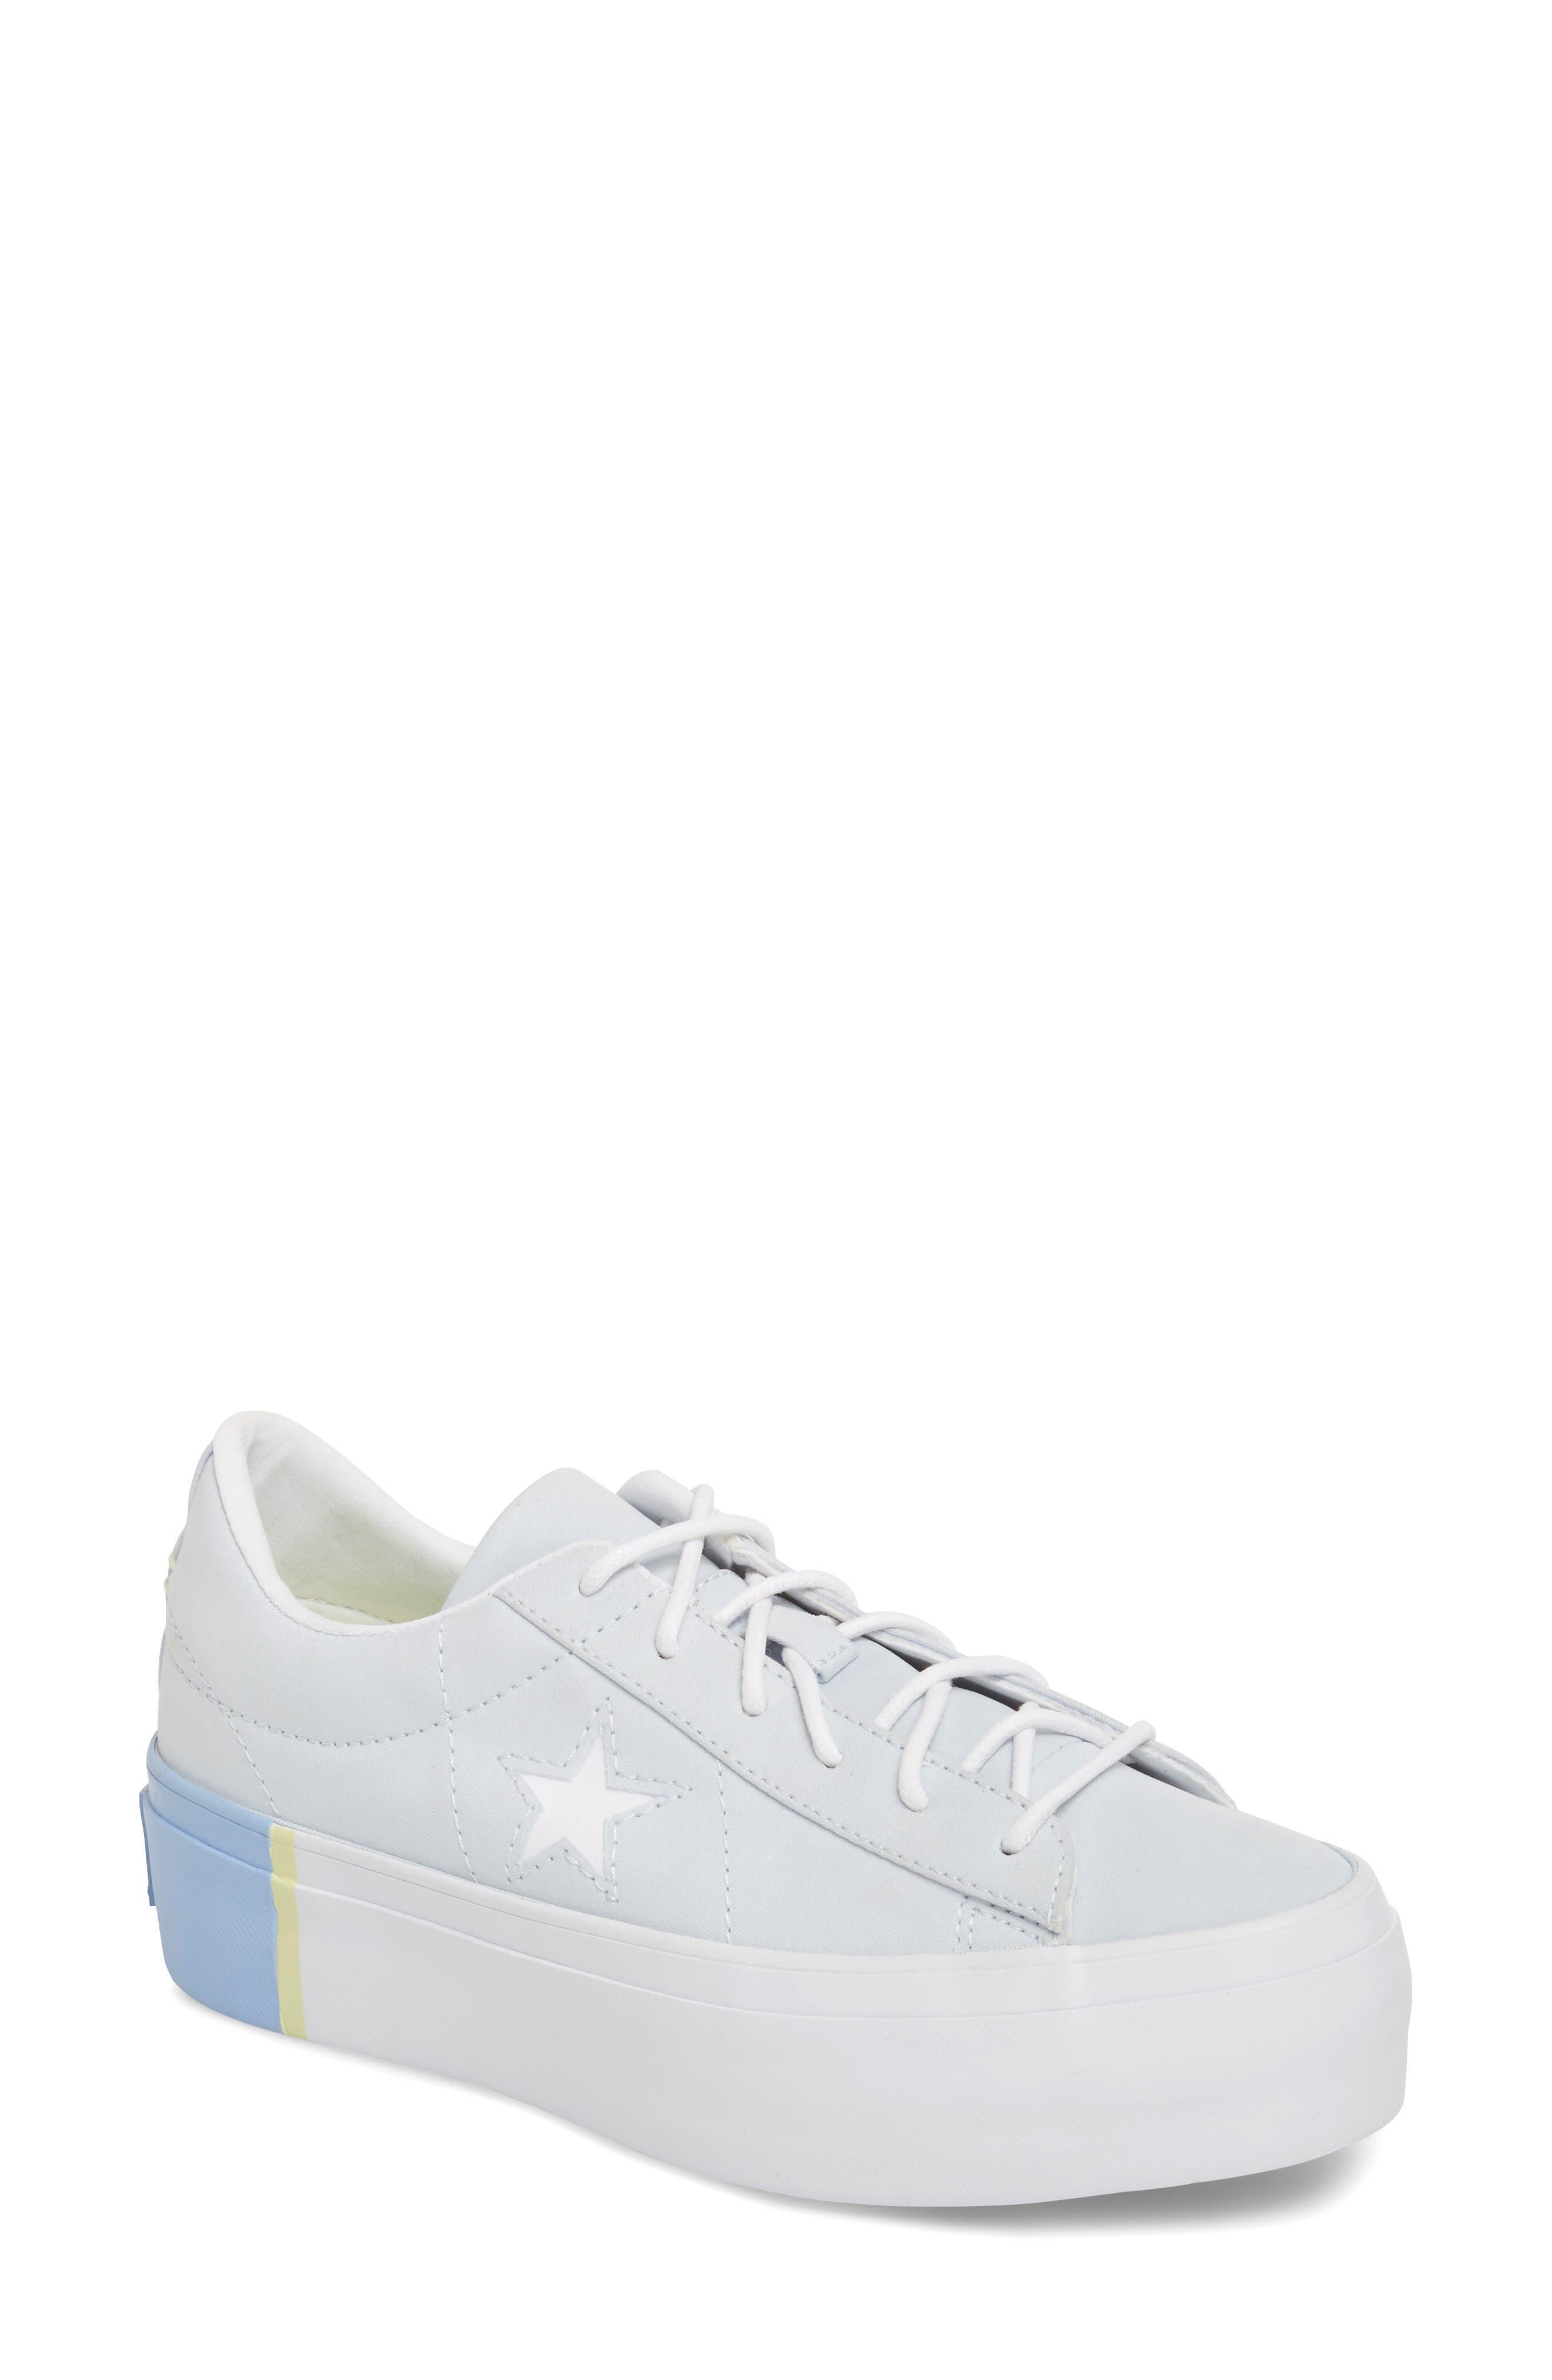 Chuck Taylor<sup>®</sup> All Star<sup>®</sup> One Star Platform Sneaker,                             Main thumbnail 2, color,